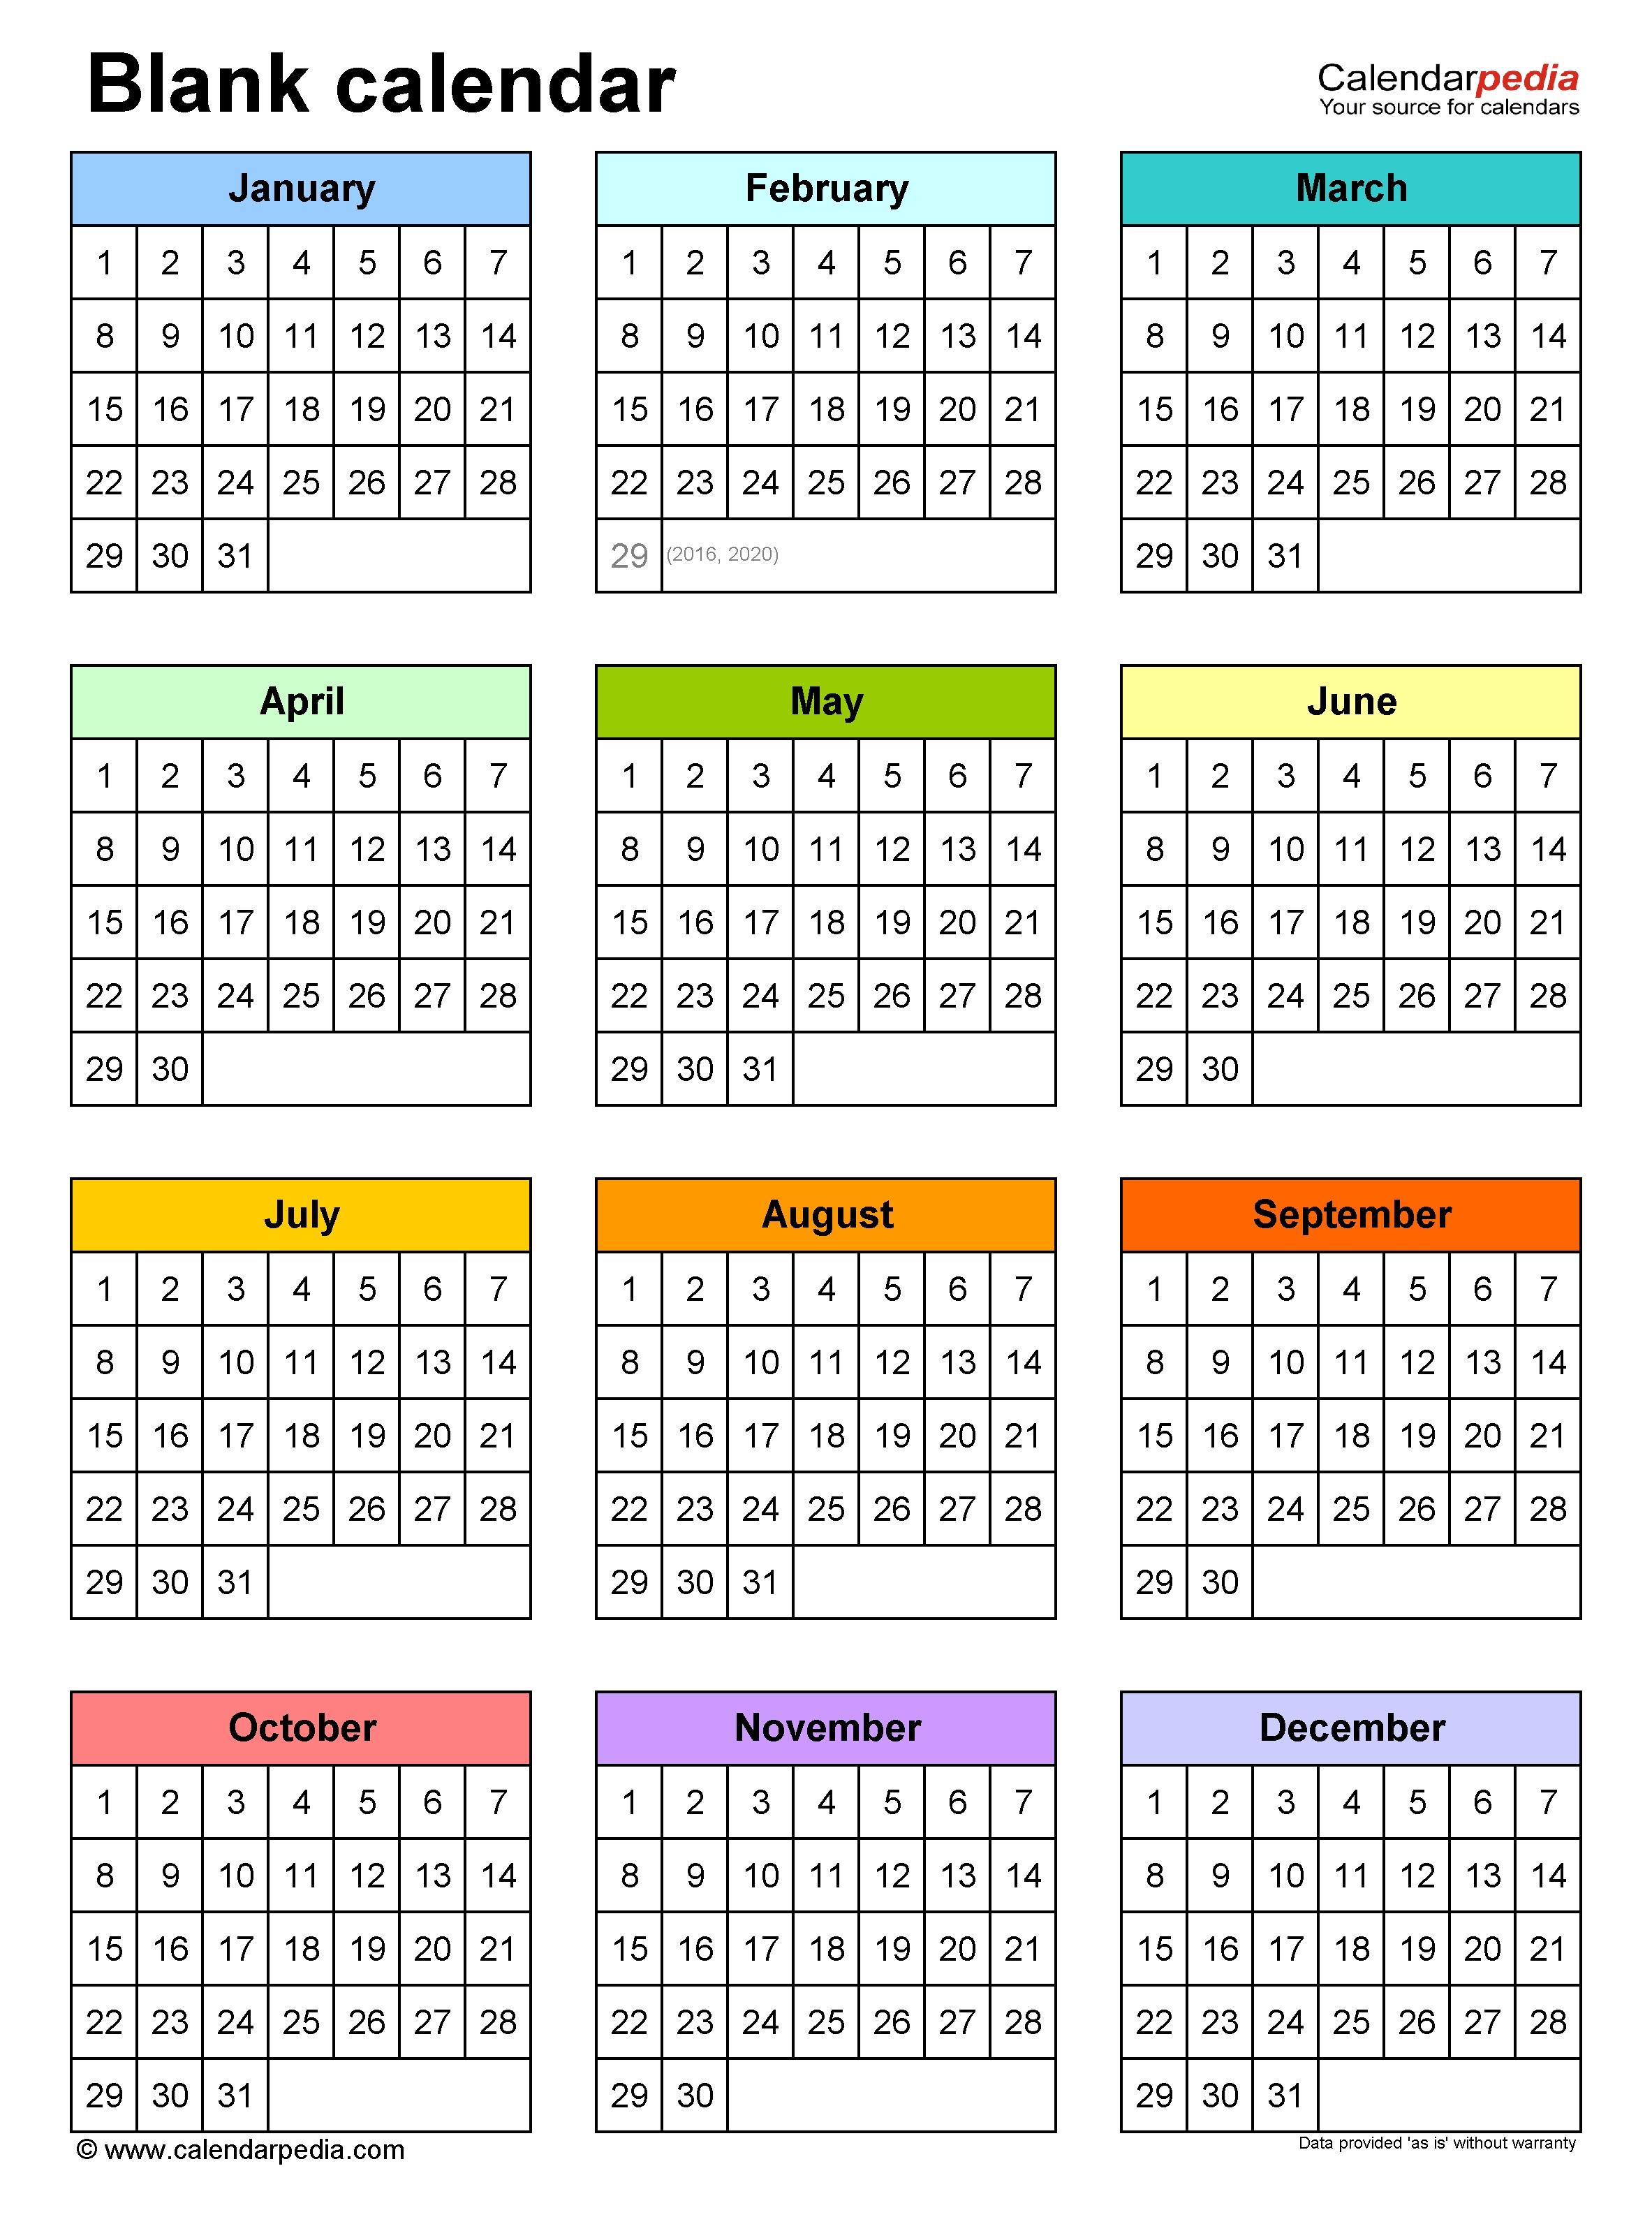 Blank Calendars - Free Printable Pdf Templates